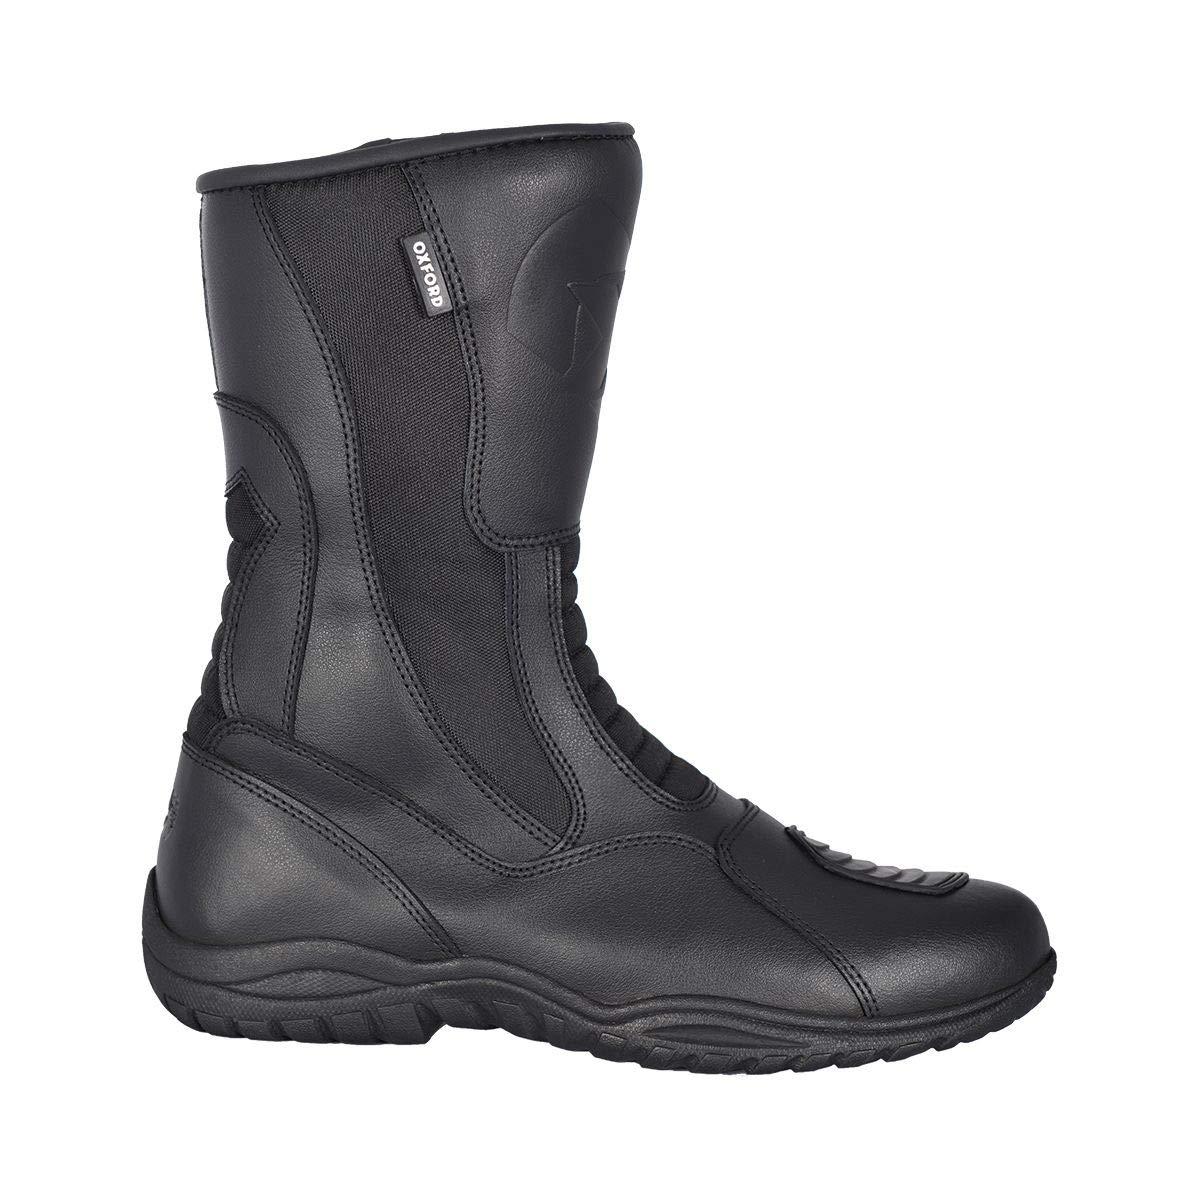 Black Oxford Tracker Waterproof Leather Motorbike Motorcycle Boots